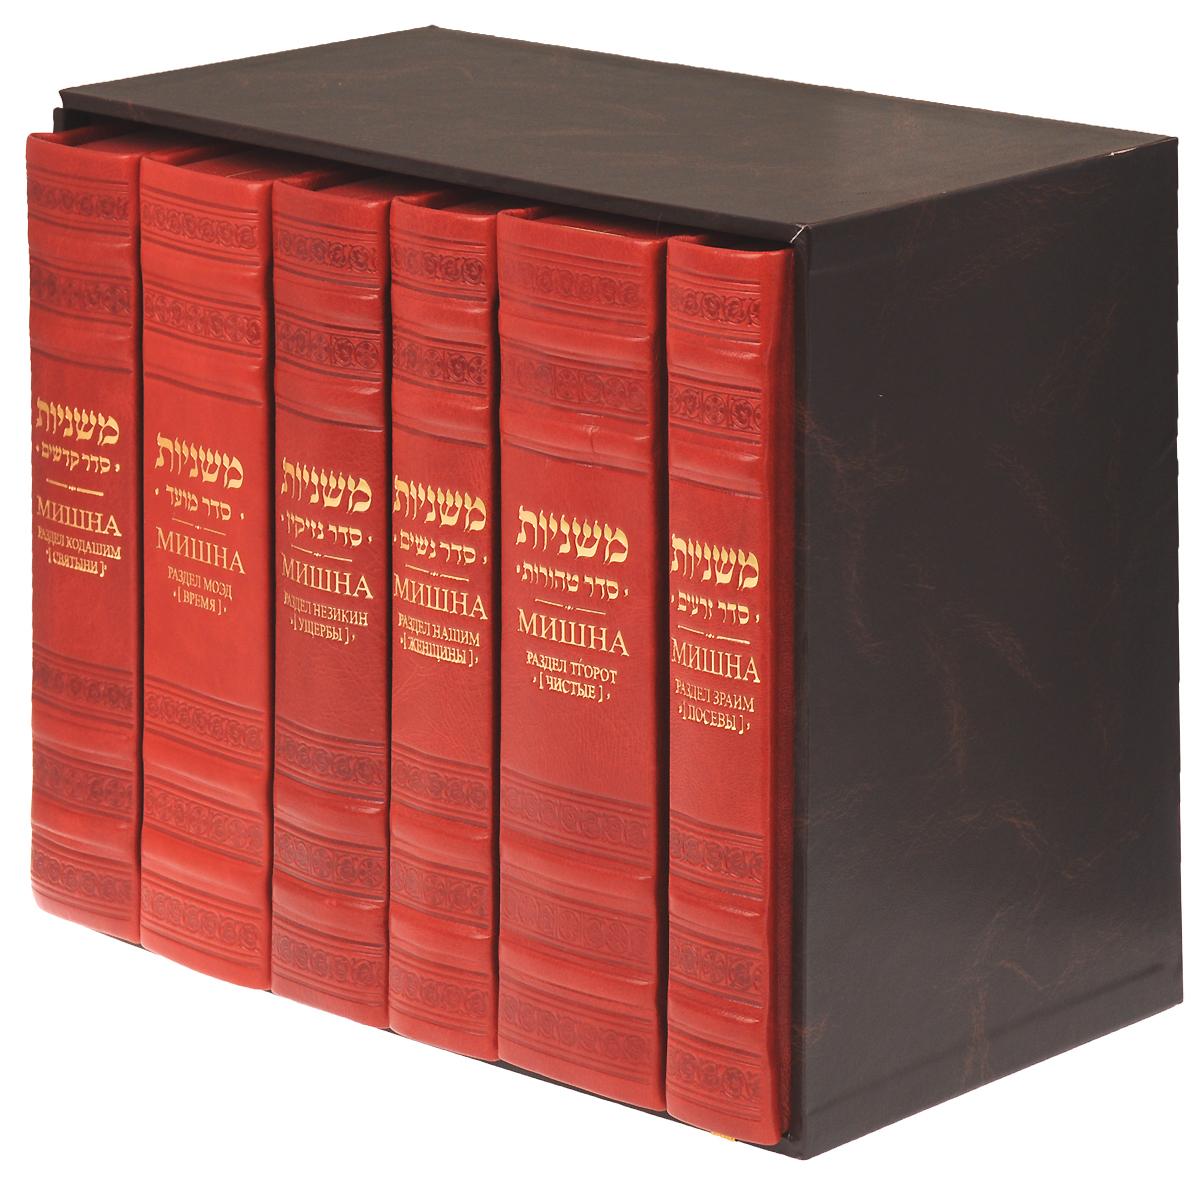 Мишна (подарочный комплект из 6 книг) the poetry of religious sorrow in early modern england